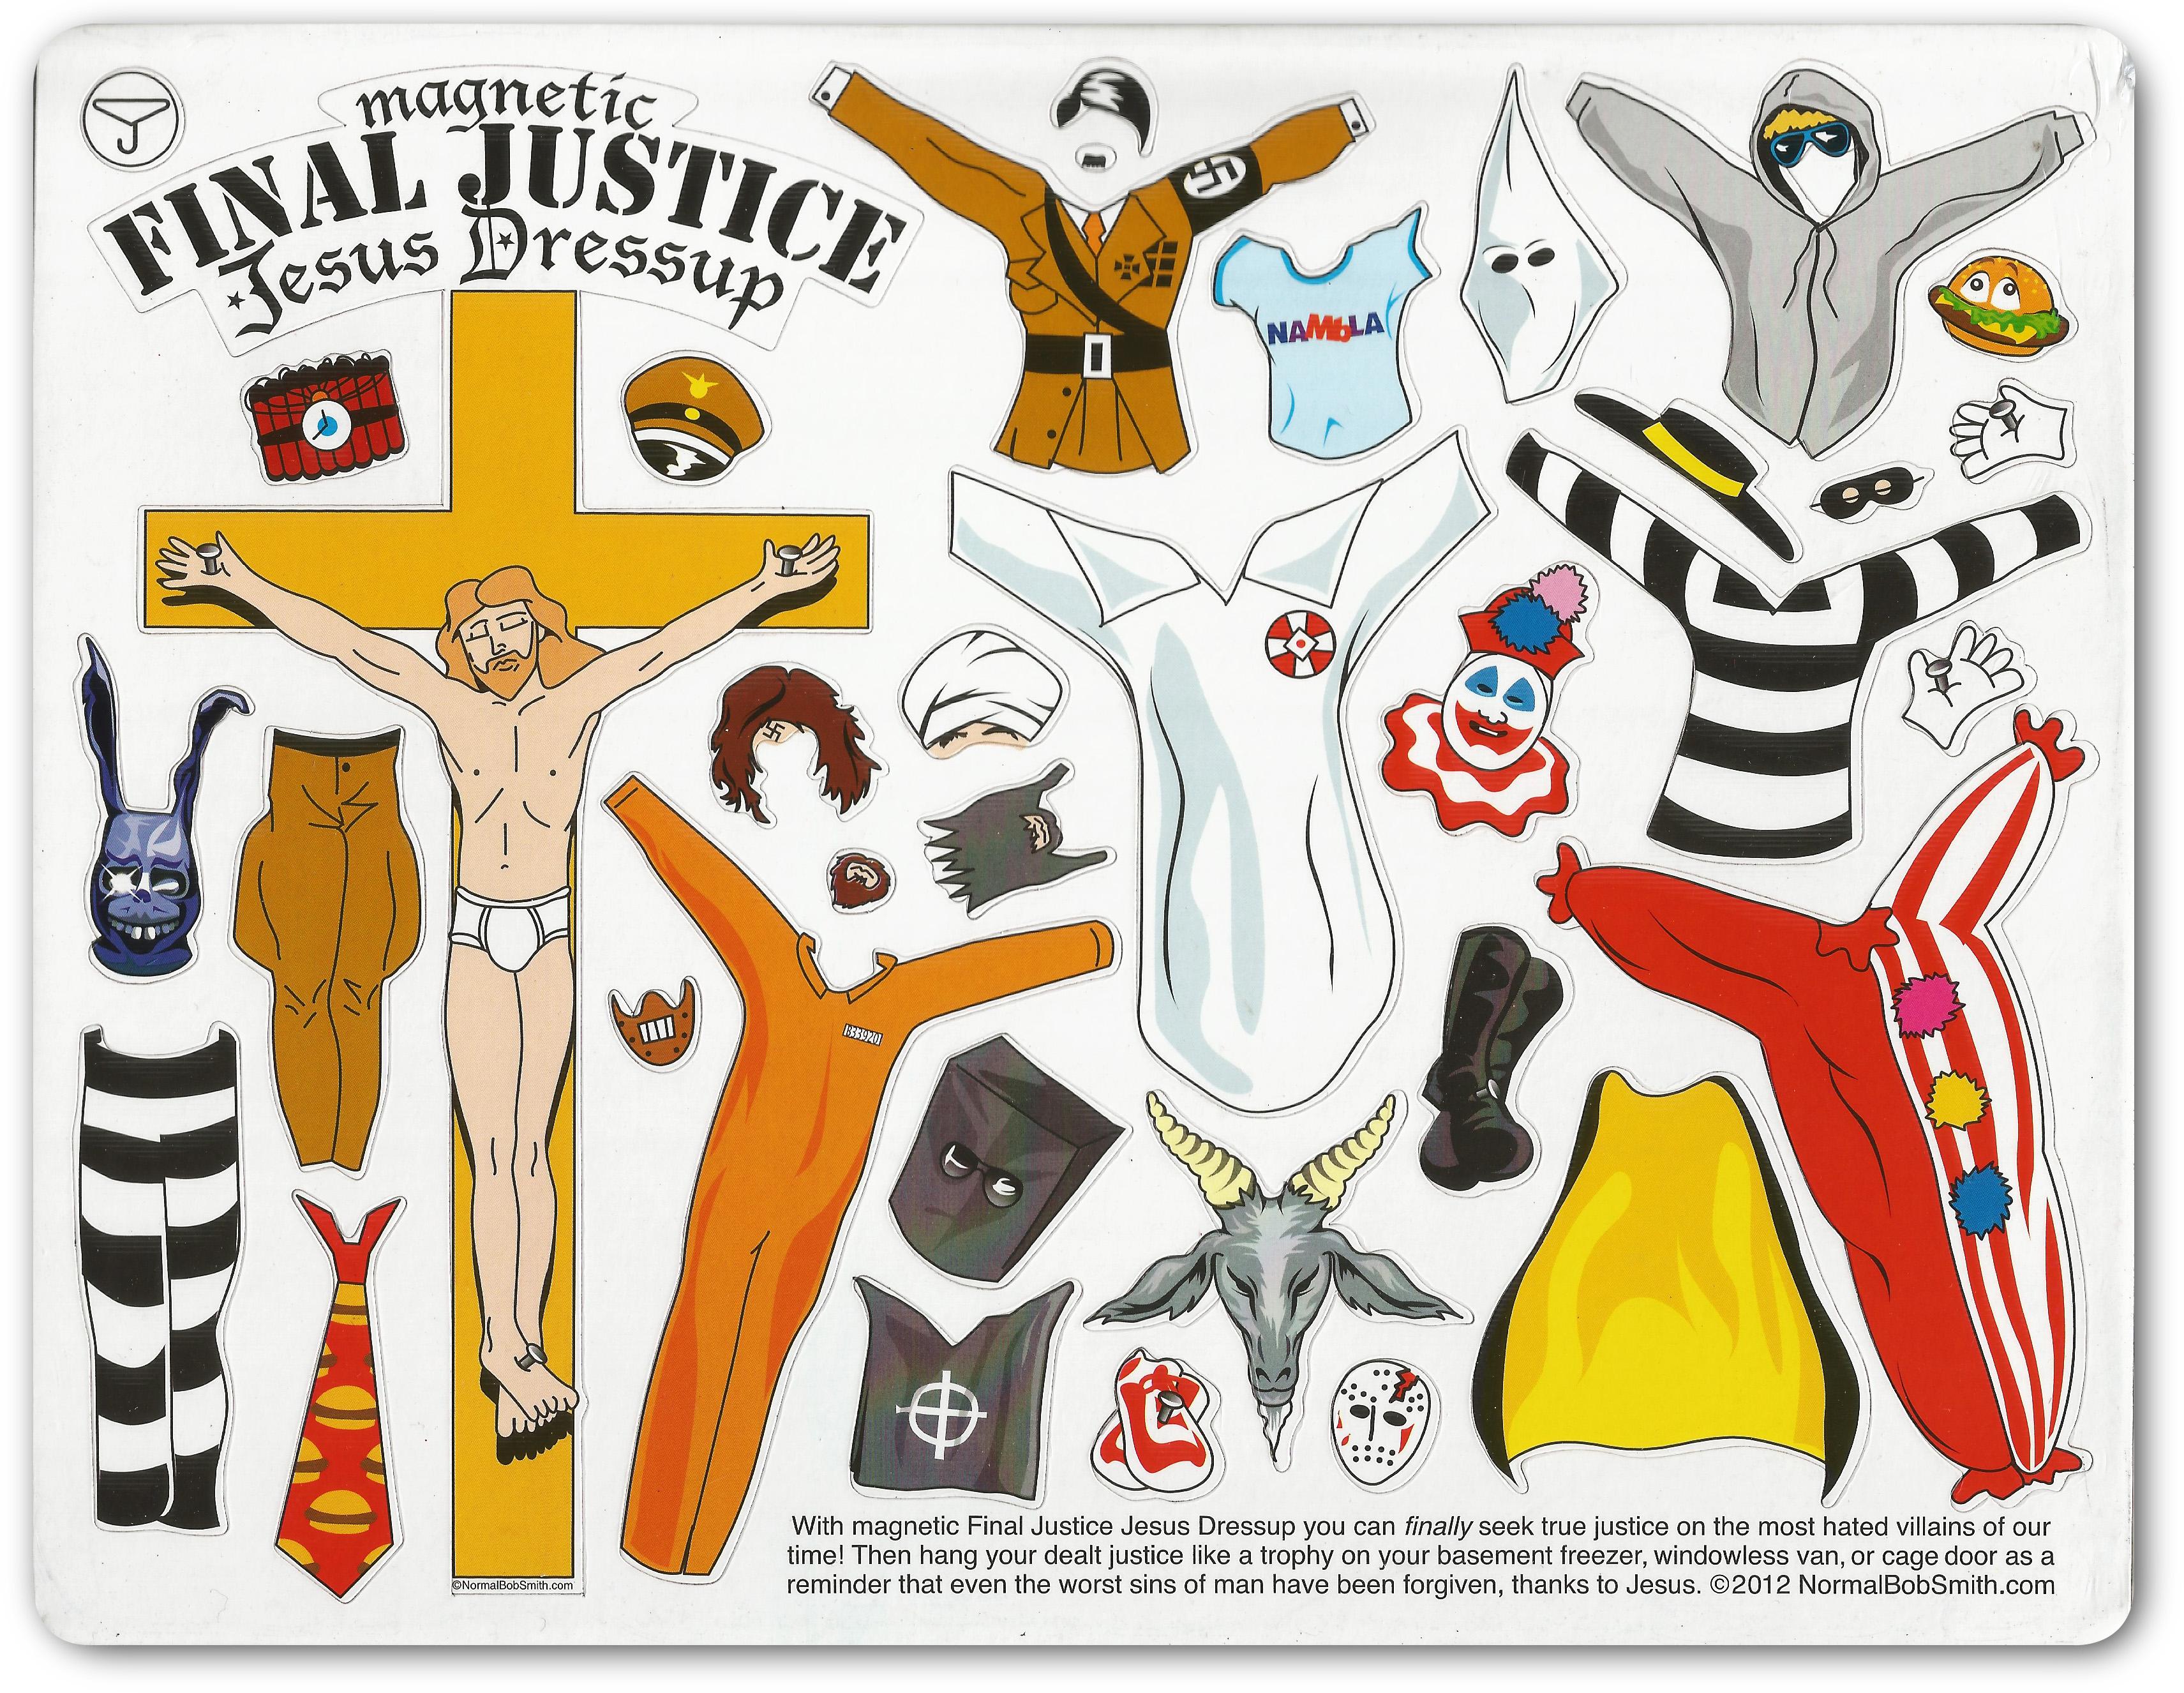 Final Justice Jesus Dressup 2012 $14